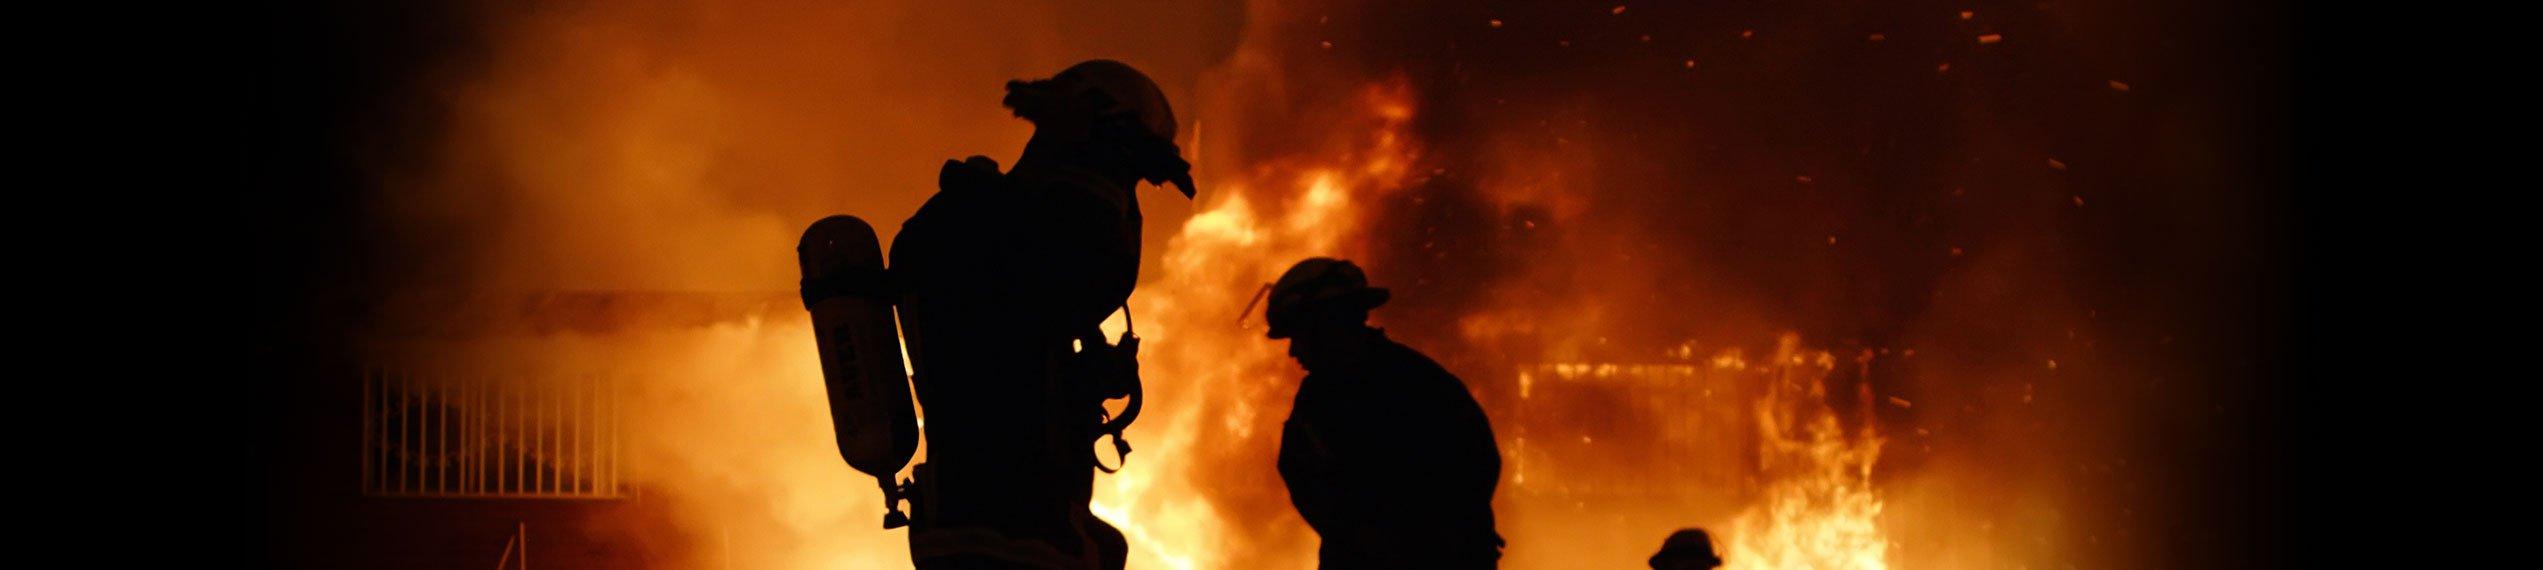 Fire & Smoke Damage Removal in Paul Davis Restoration of Allegheny County